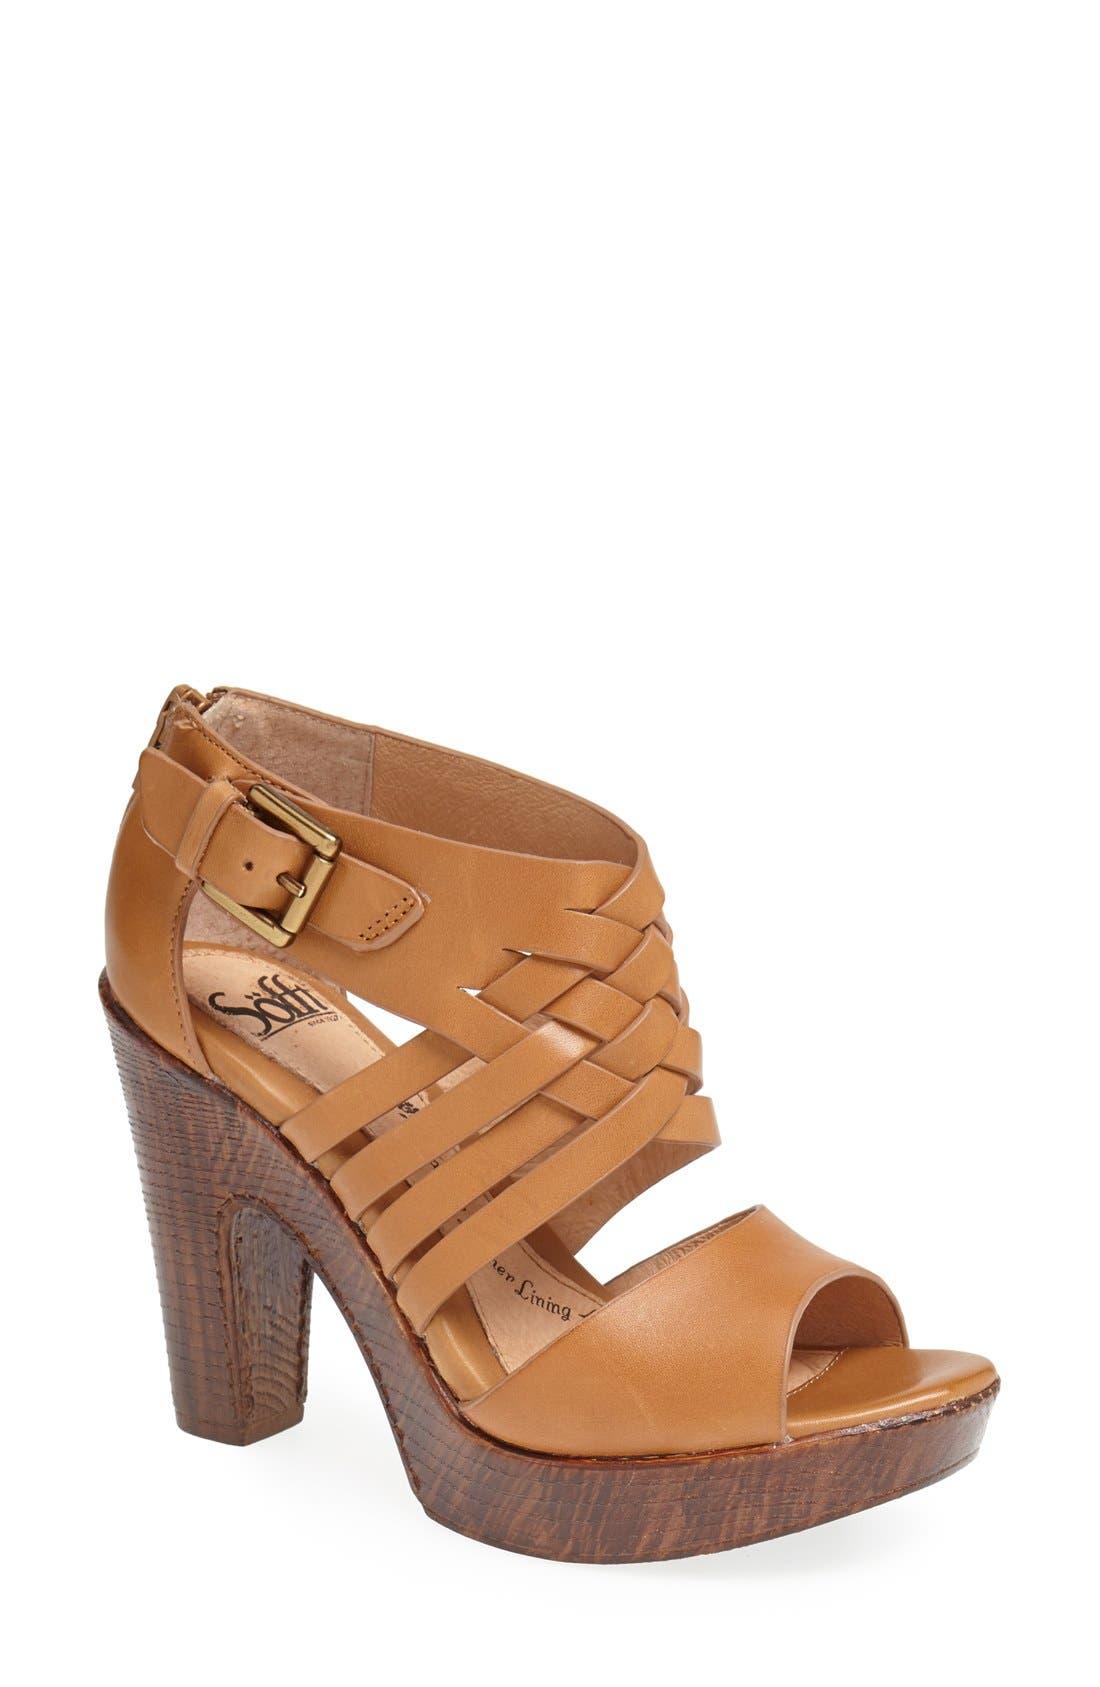 Main Image - Söfft 'Ohanna' Leather Sandal (Women)